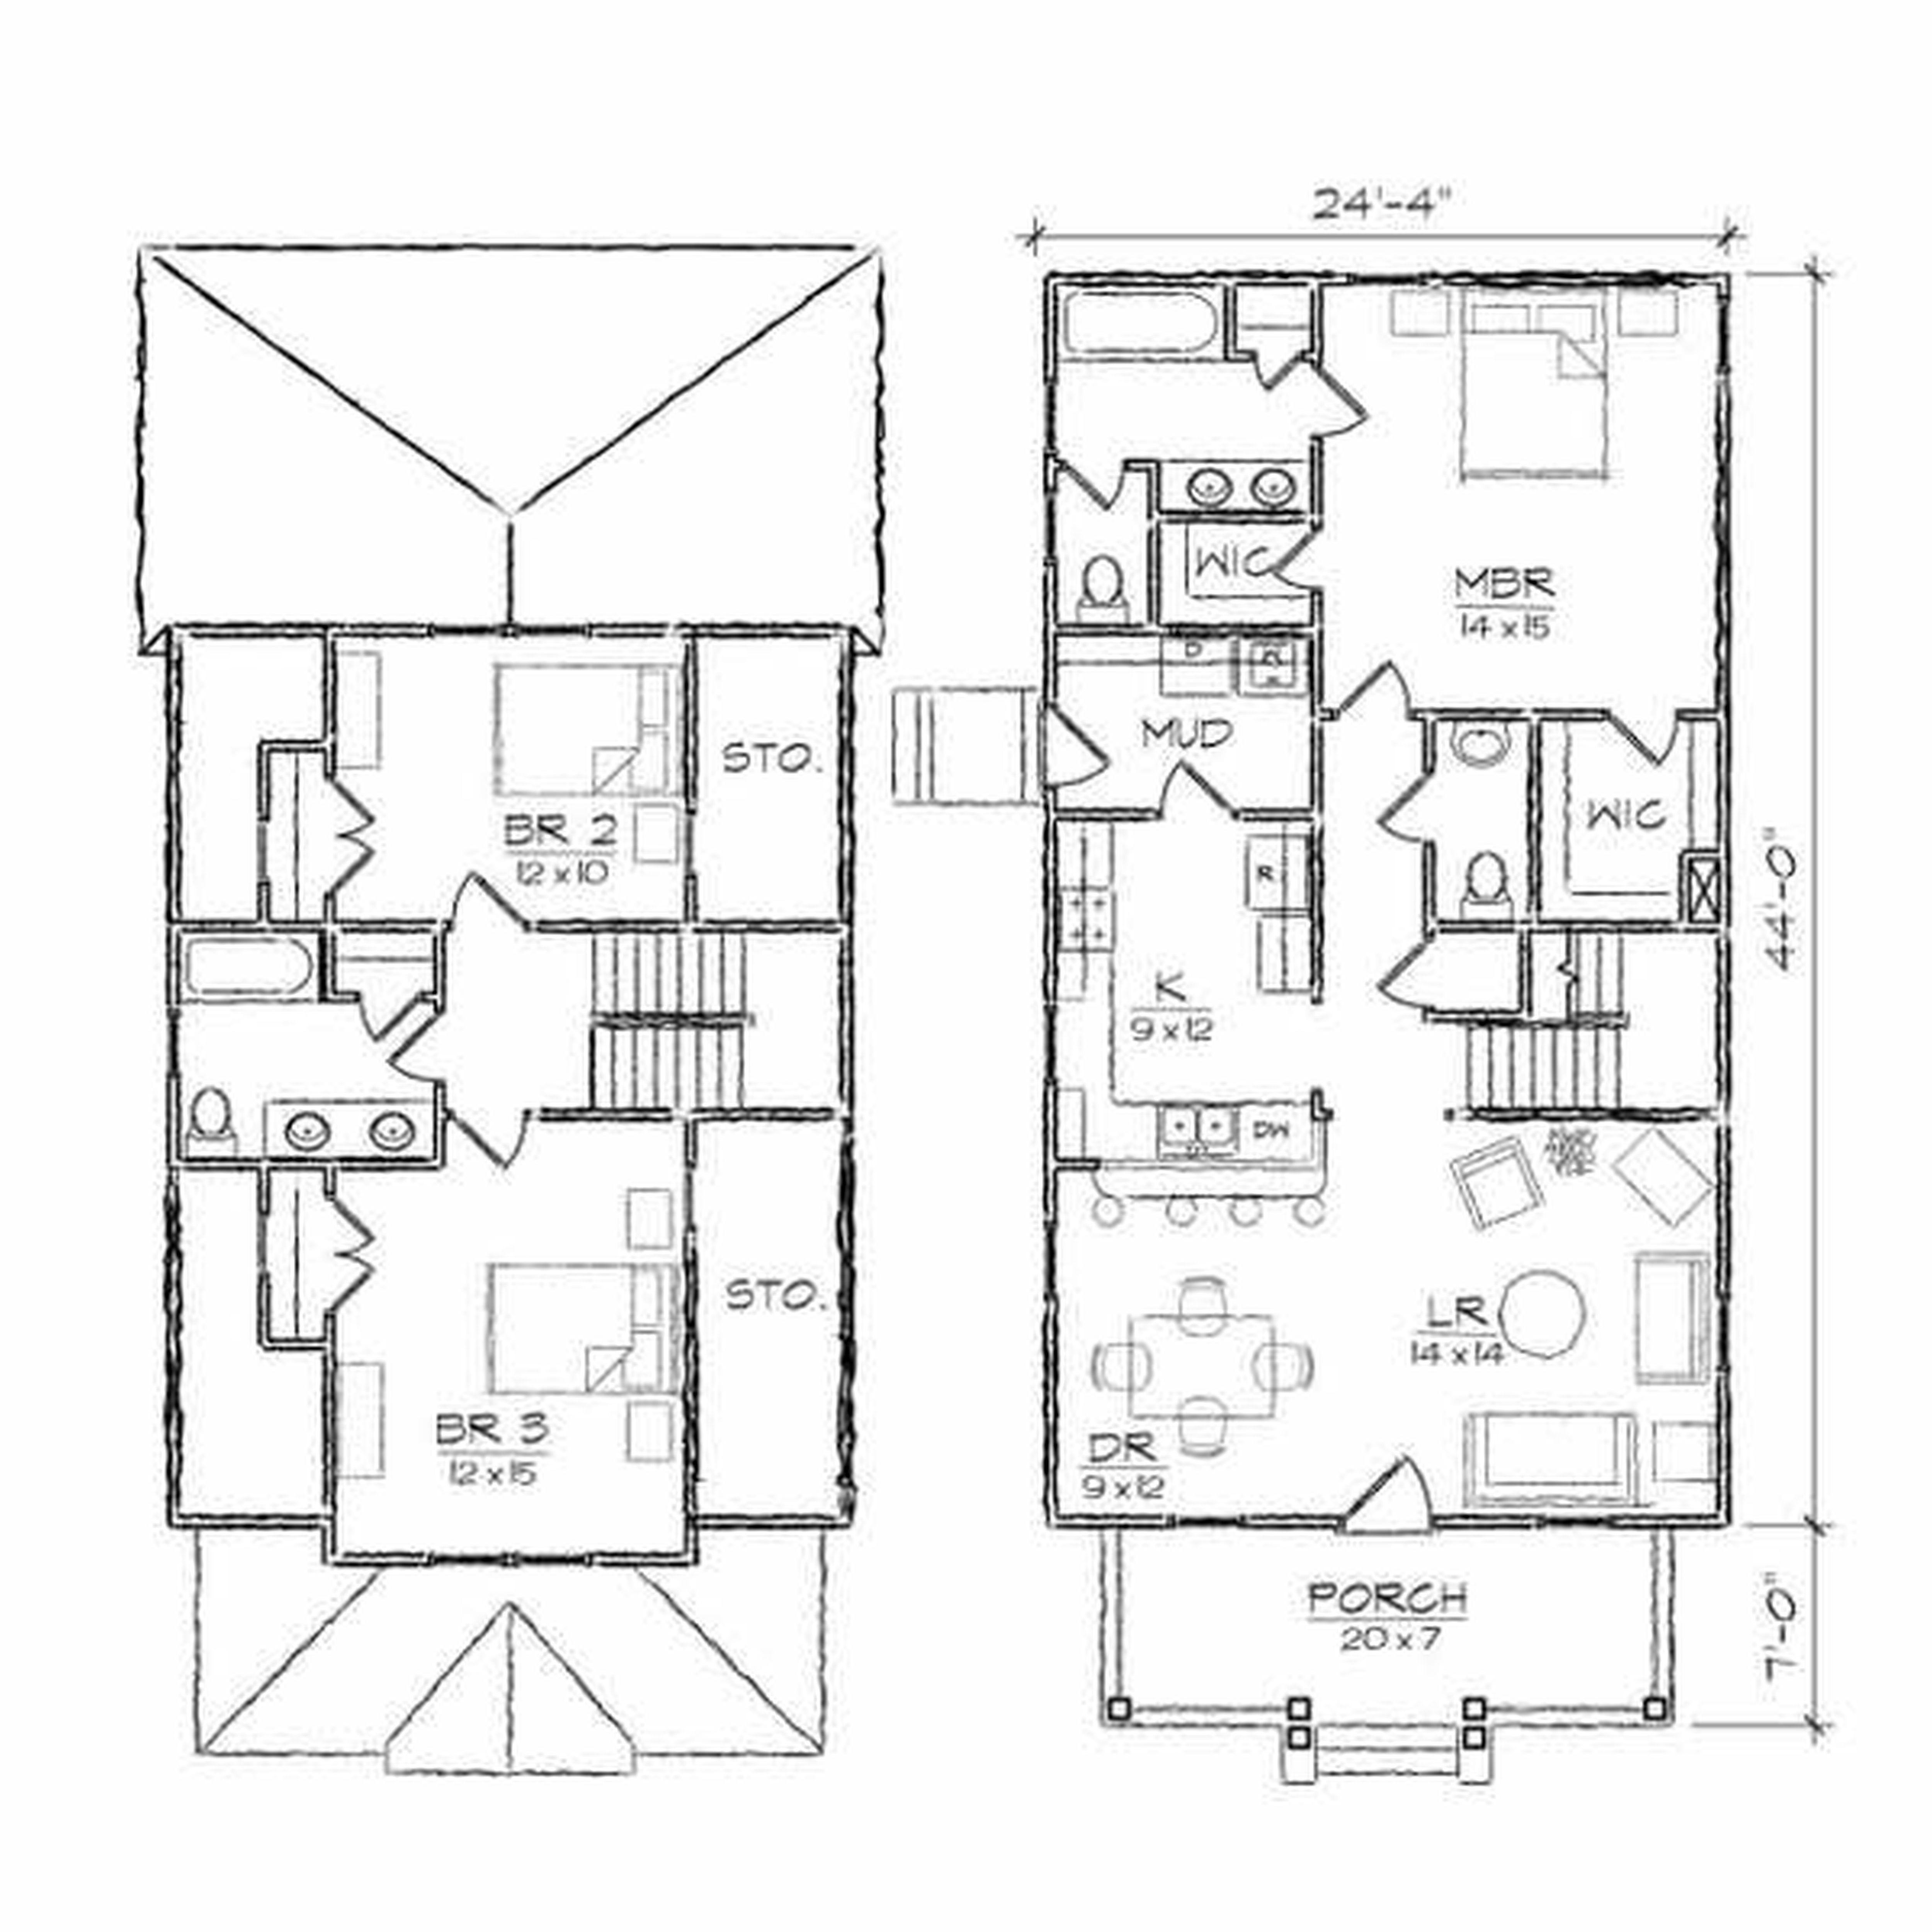 5000x5000 House Plan Programs Floorplan Creater